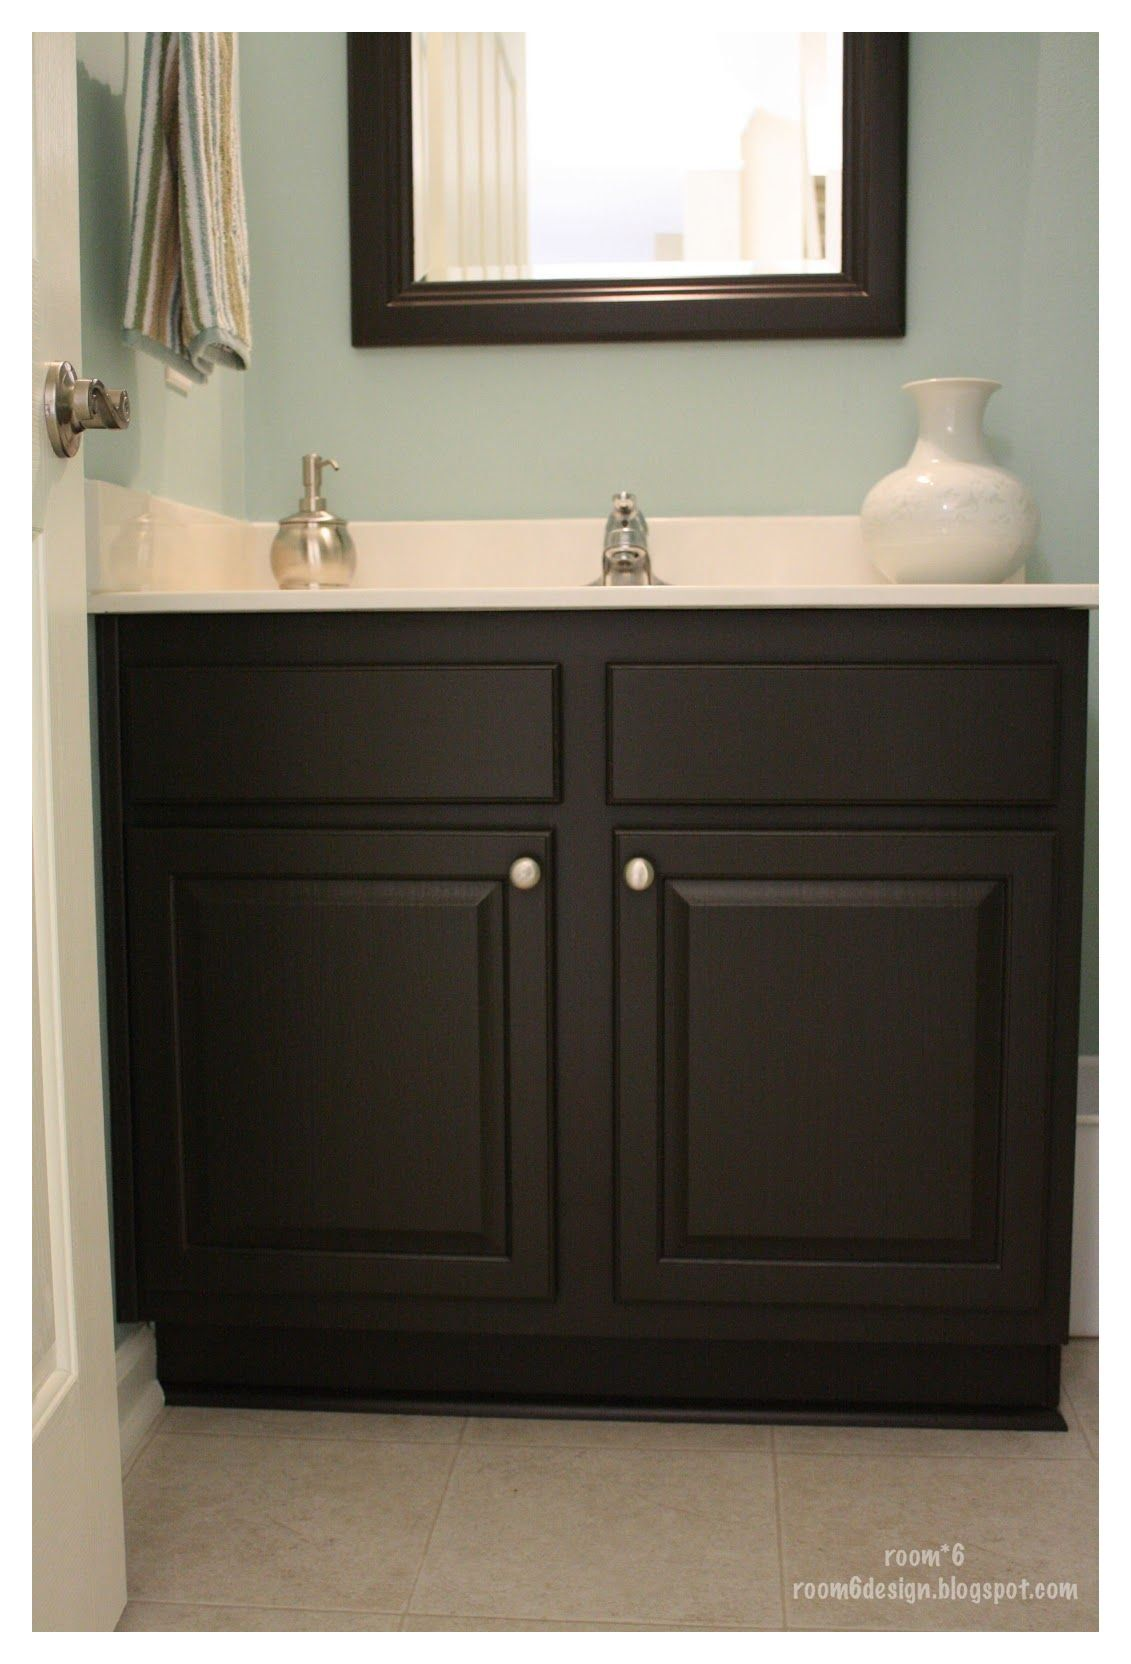 Espresso Bathroom Cabinets Counter Tops Oh I Want To Paint Our Bathroom Cabinet In 2020 Bathroom Cabinet Colors Painting Bathroom Cabinets Painted Vanity Bathroom